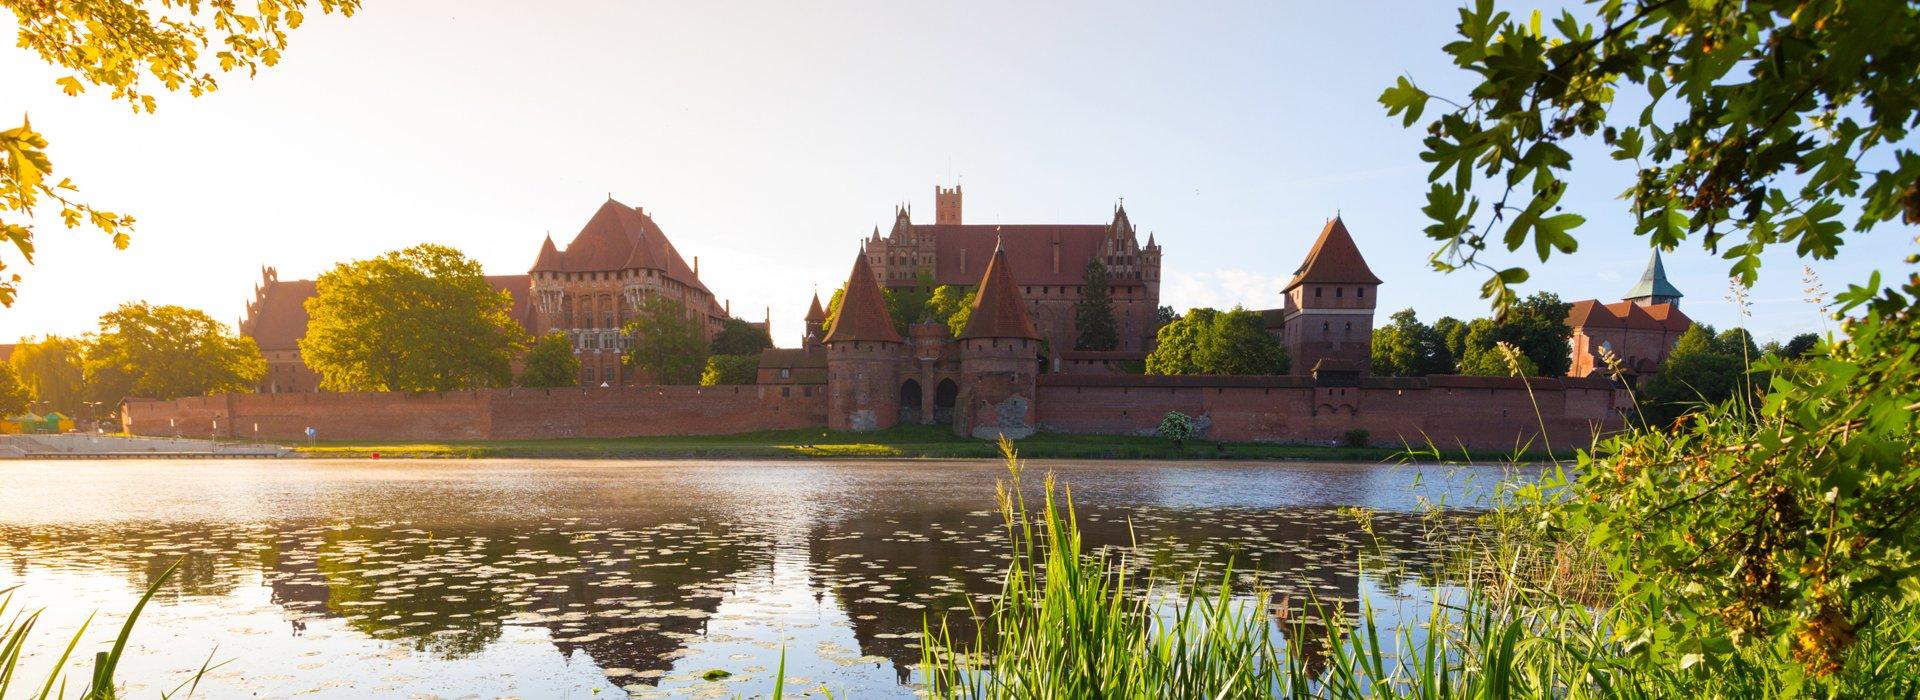 Malbork - the grand medieval castle